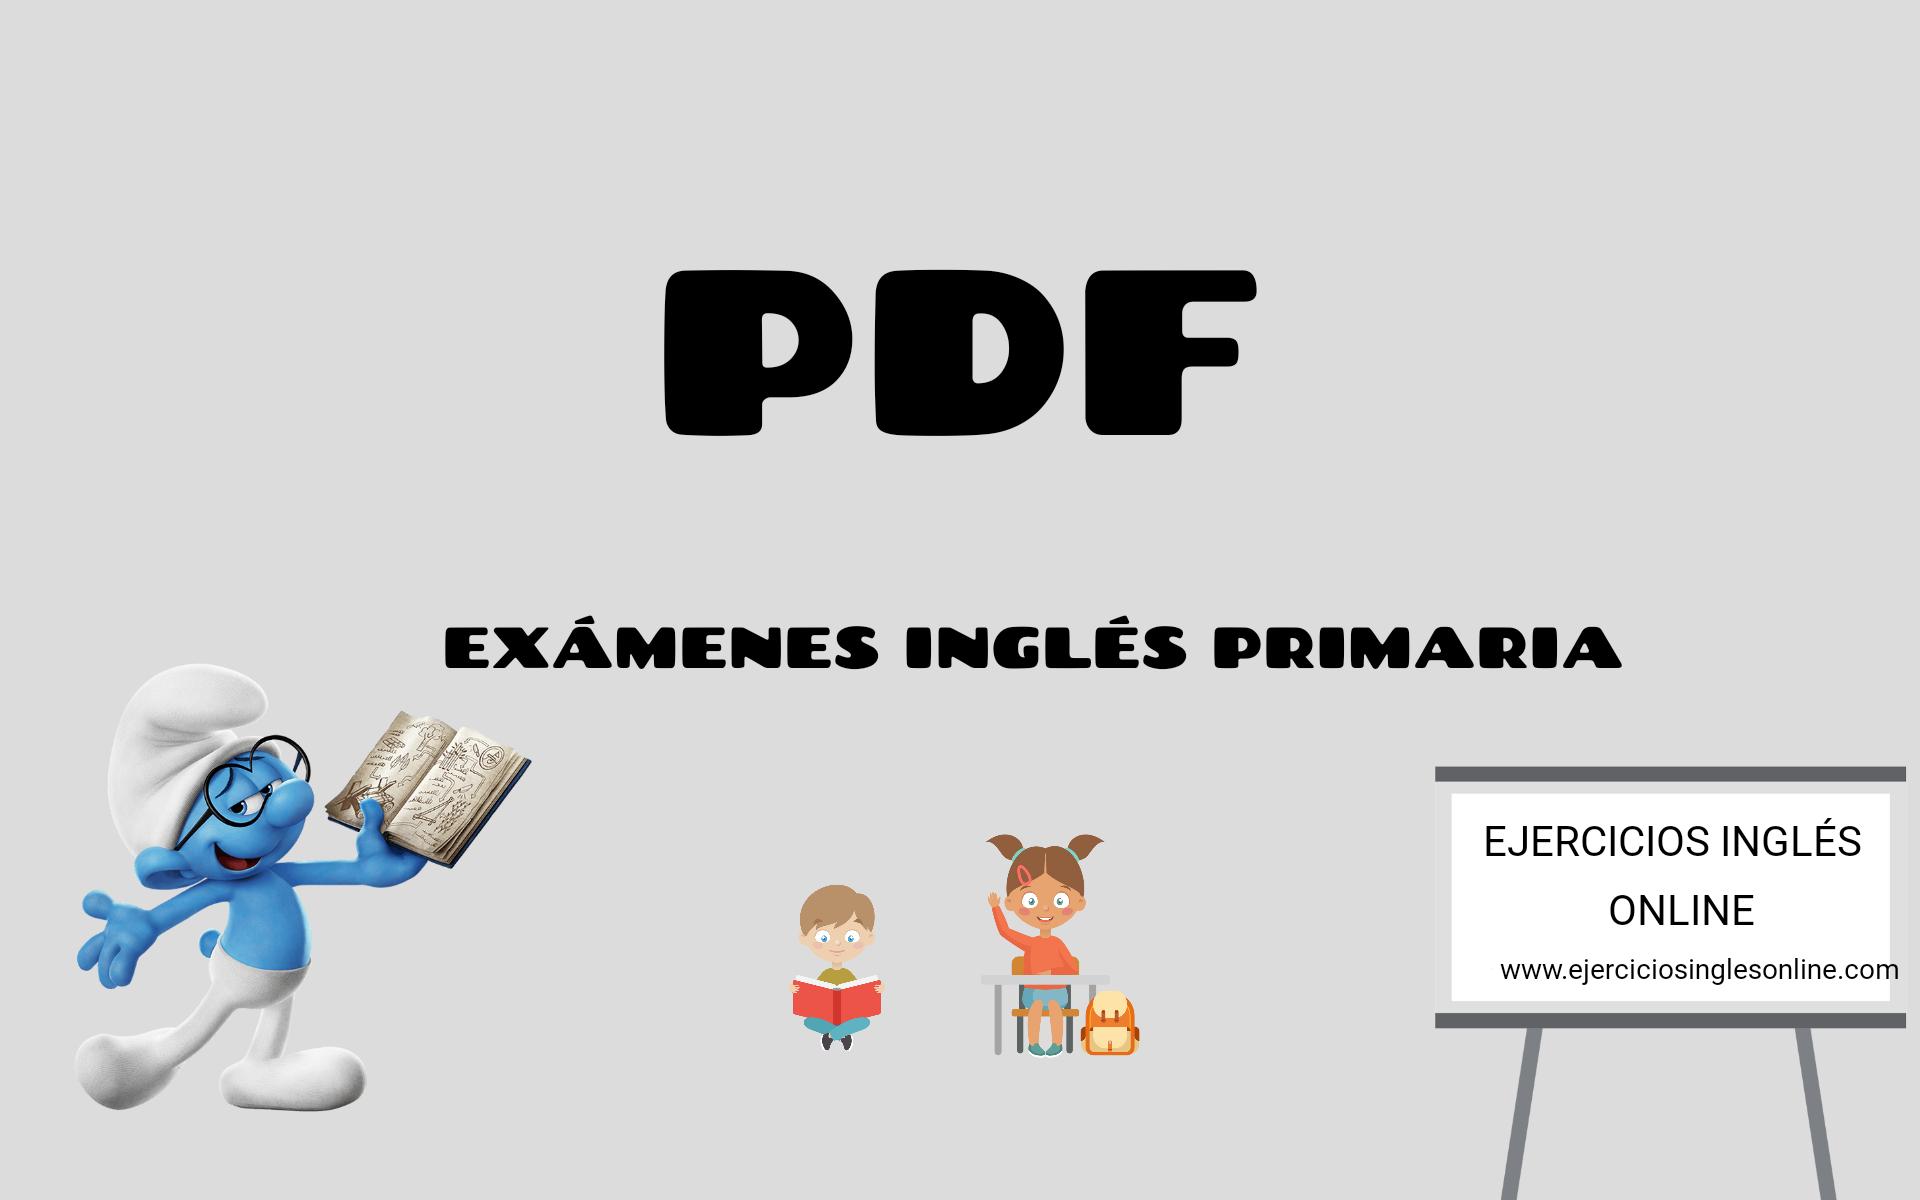 Exámenes Inglés Primaria Pdf Ejercicios Inglés Online